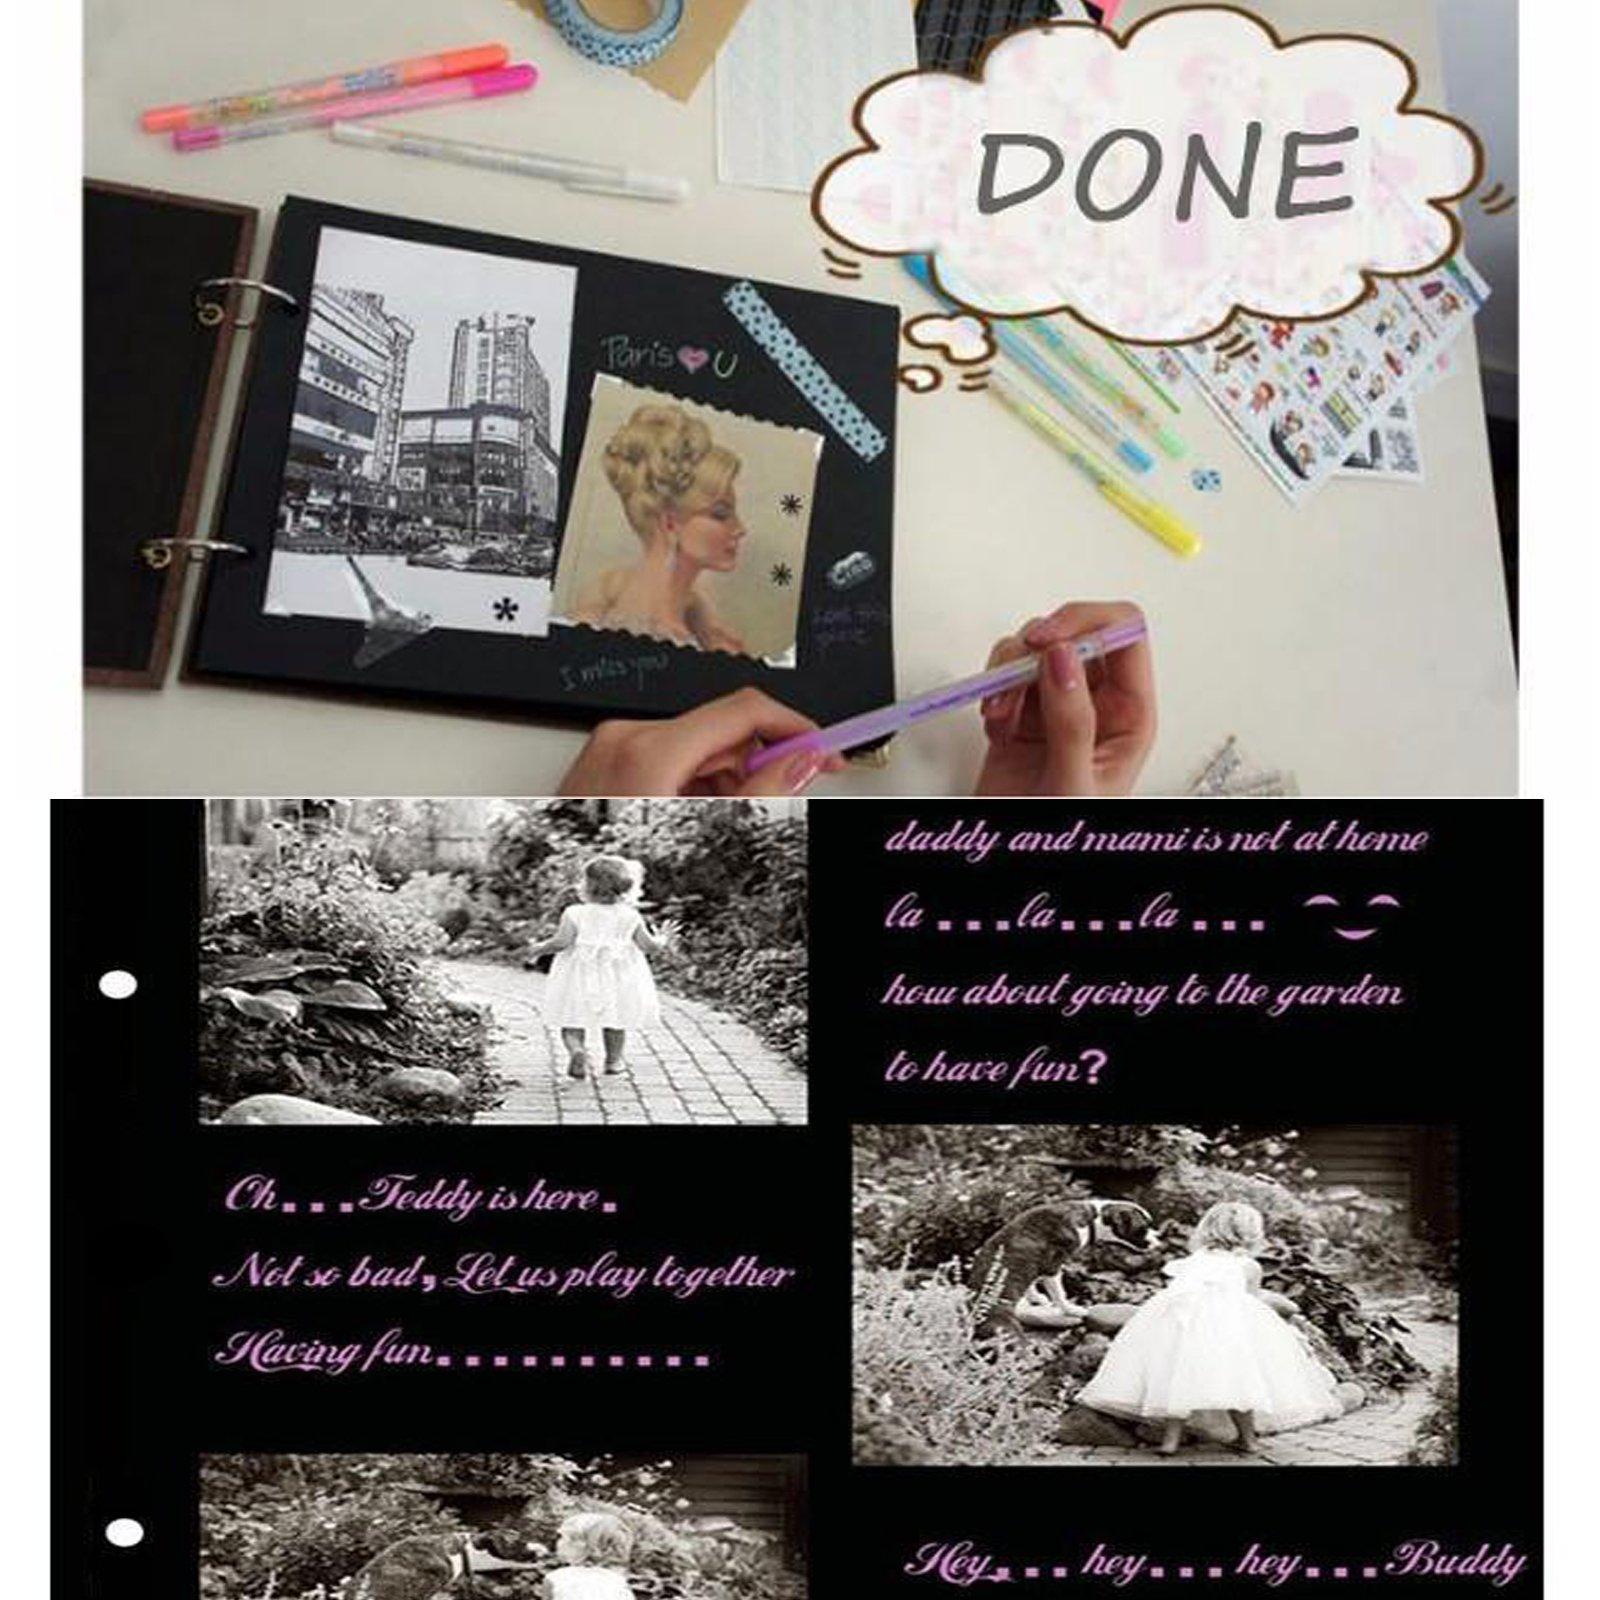 Sehaz Artworks HappyEveryday Scrapbook Photo Albums for 4x6 Photos for Baby Birthdays Couples Husband Wife Wedding 26 cm X 16 cm X 4 cm, Brown